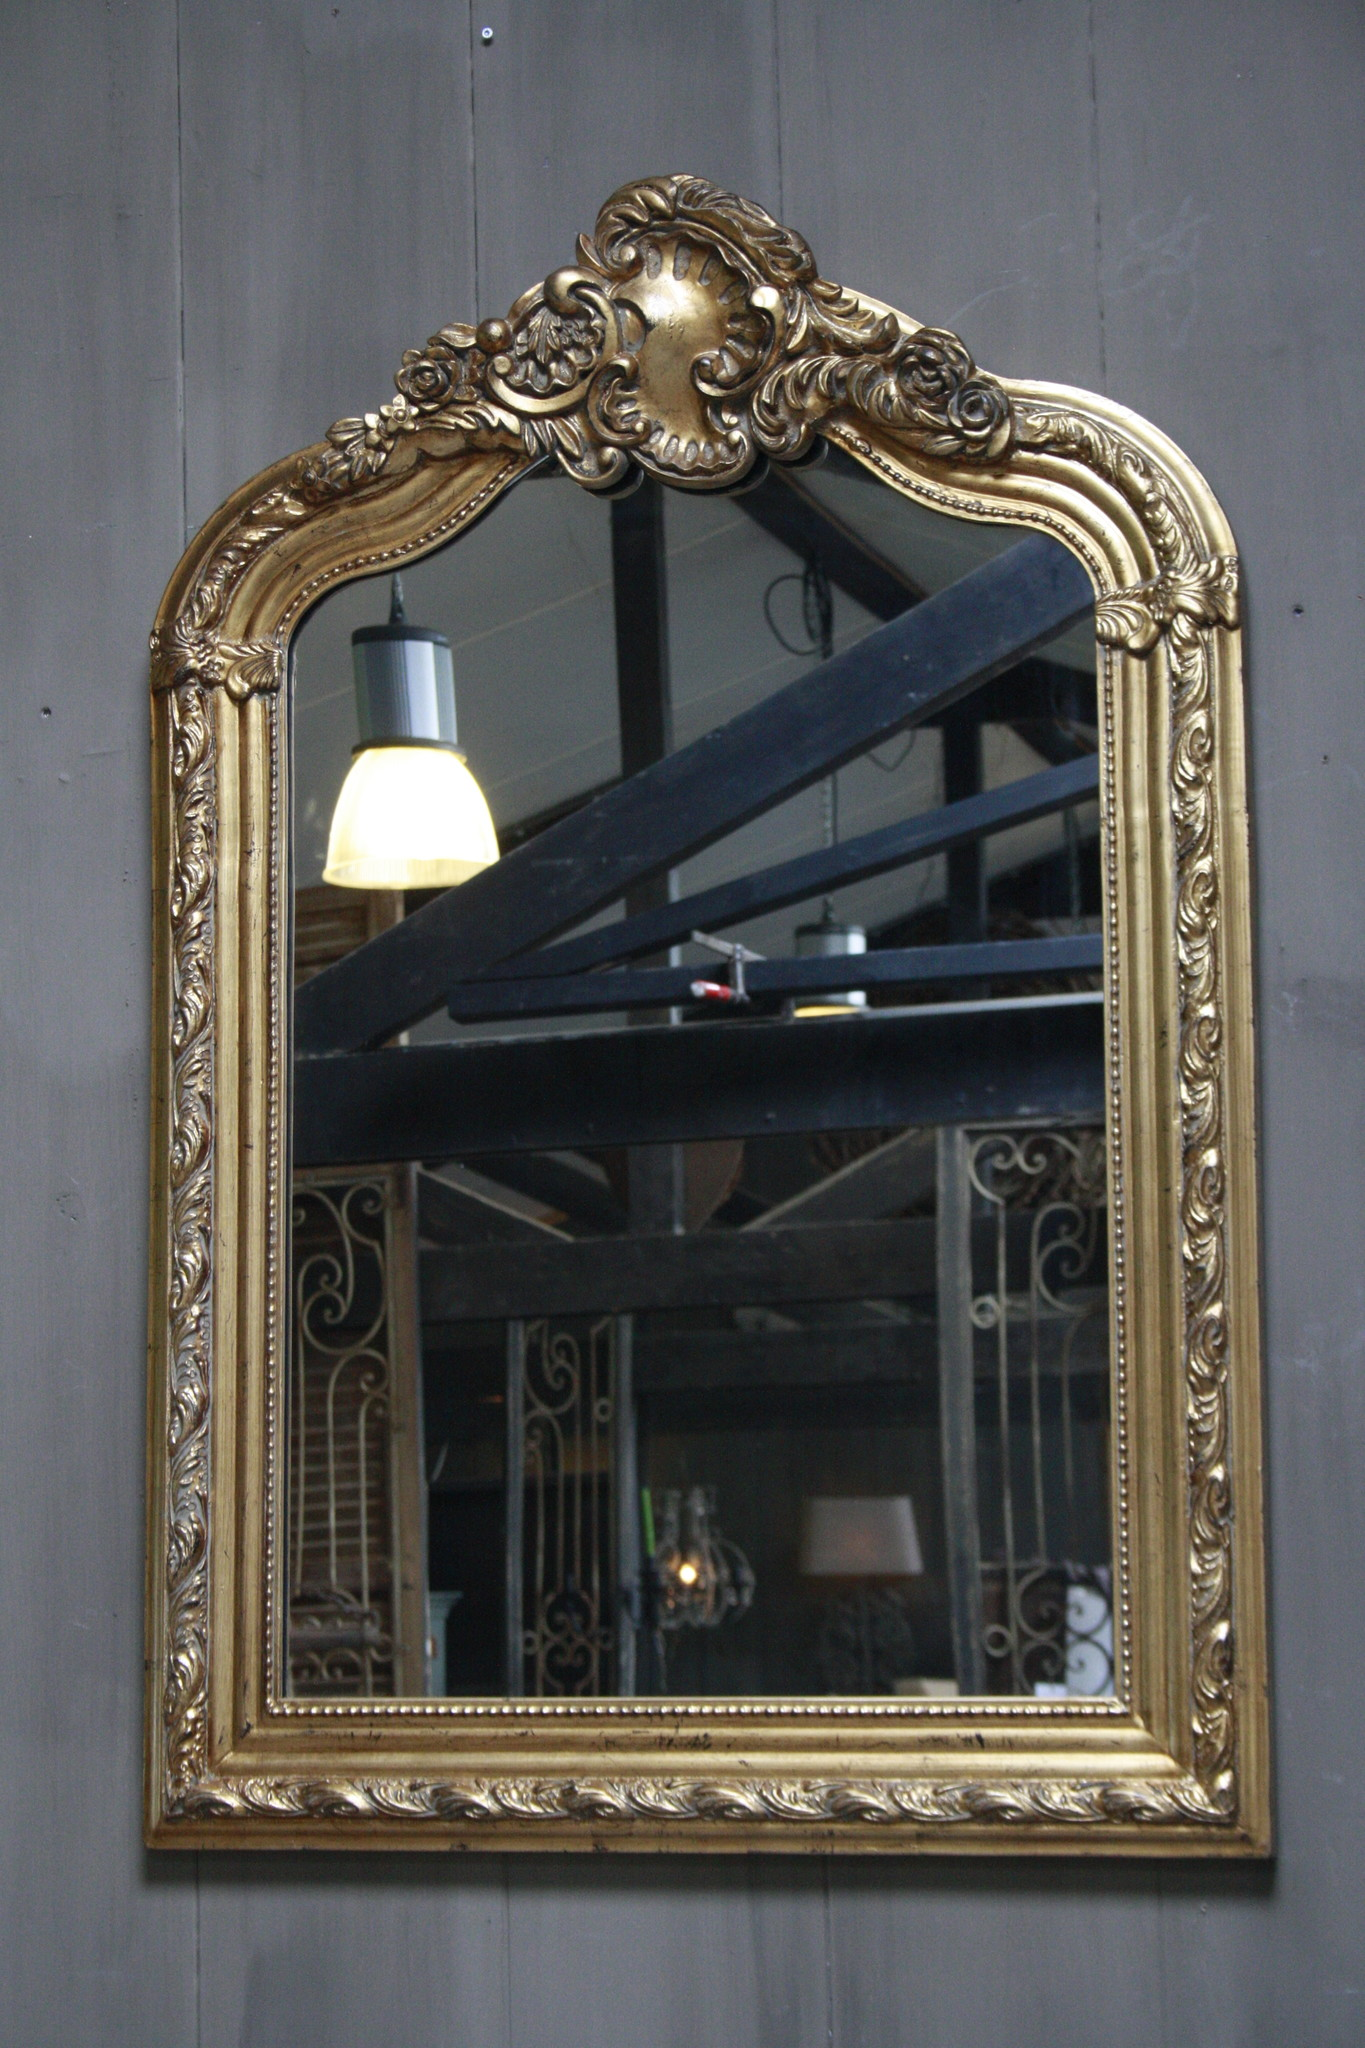 Kuifspiegel Barok Roma Goud 117 x 80 cm-2